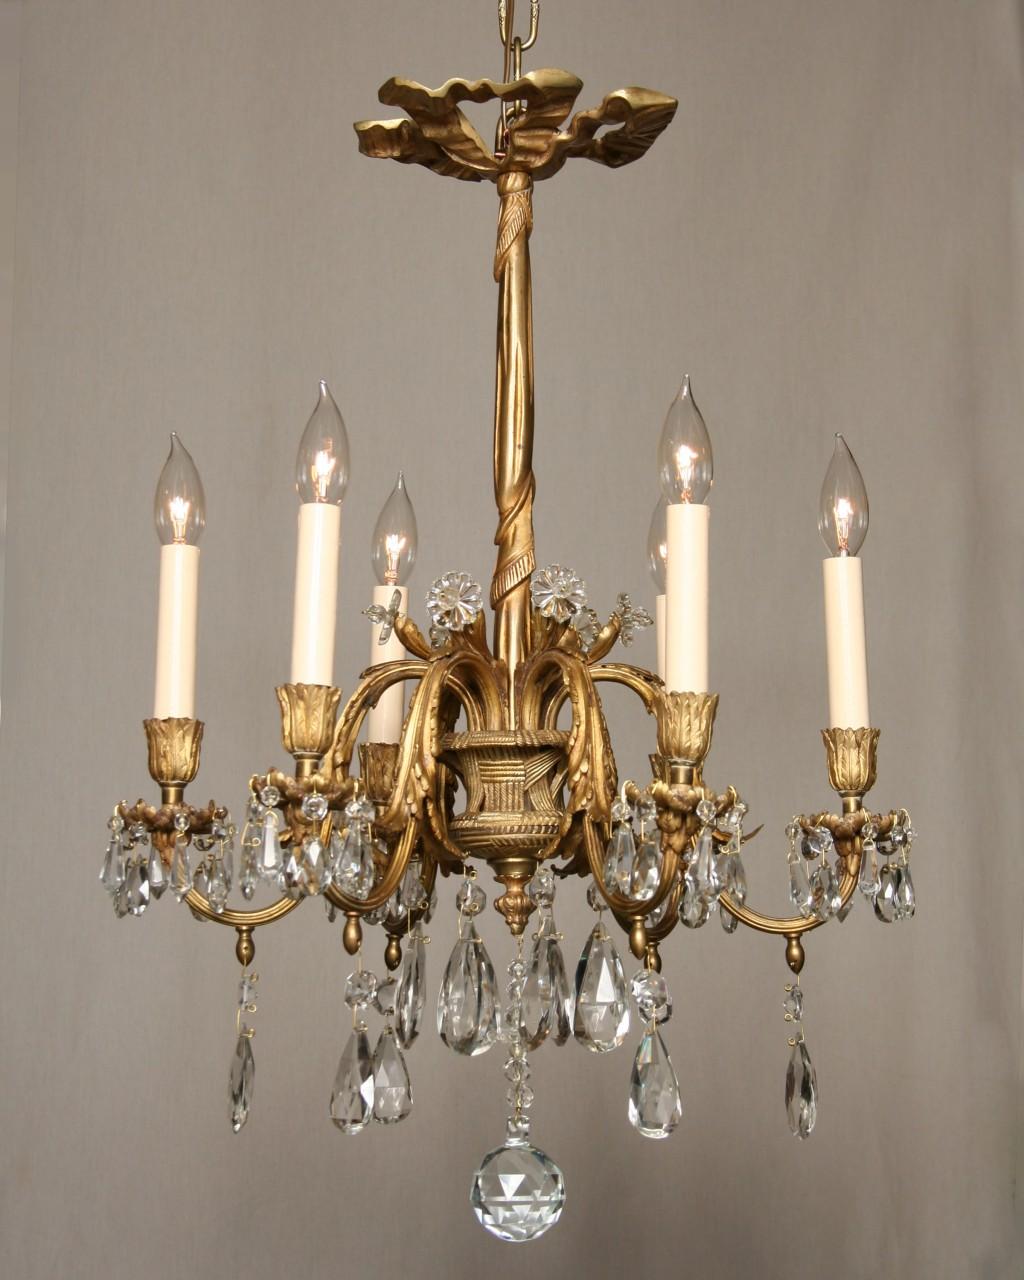 Vintage french basket chandelier in gold crystal c1945 aloadofball Choice Image